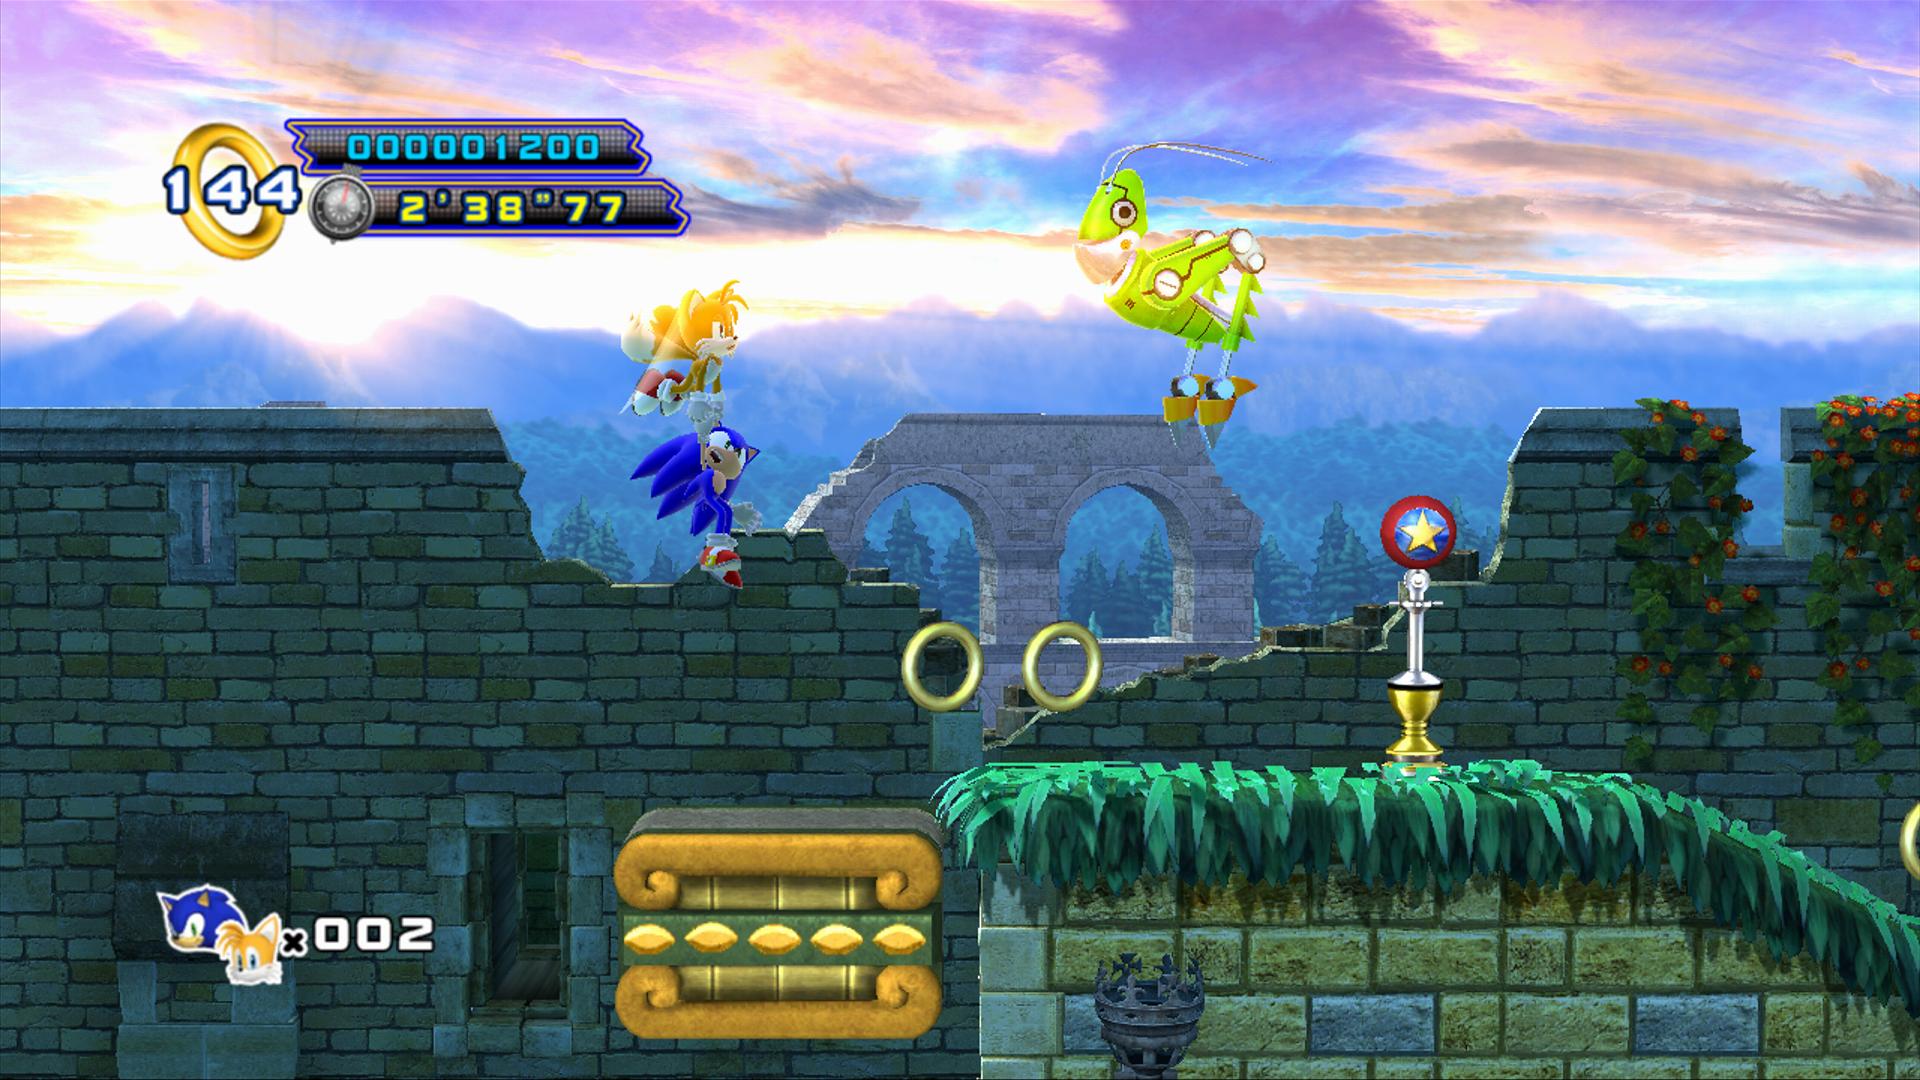 Sonic the Hedgehog 4 - Episode II screenshot